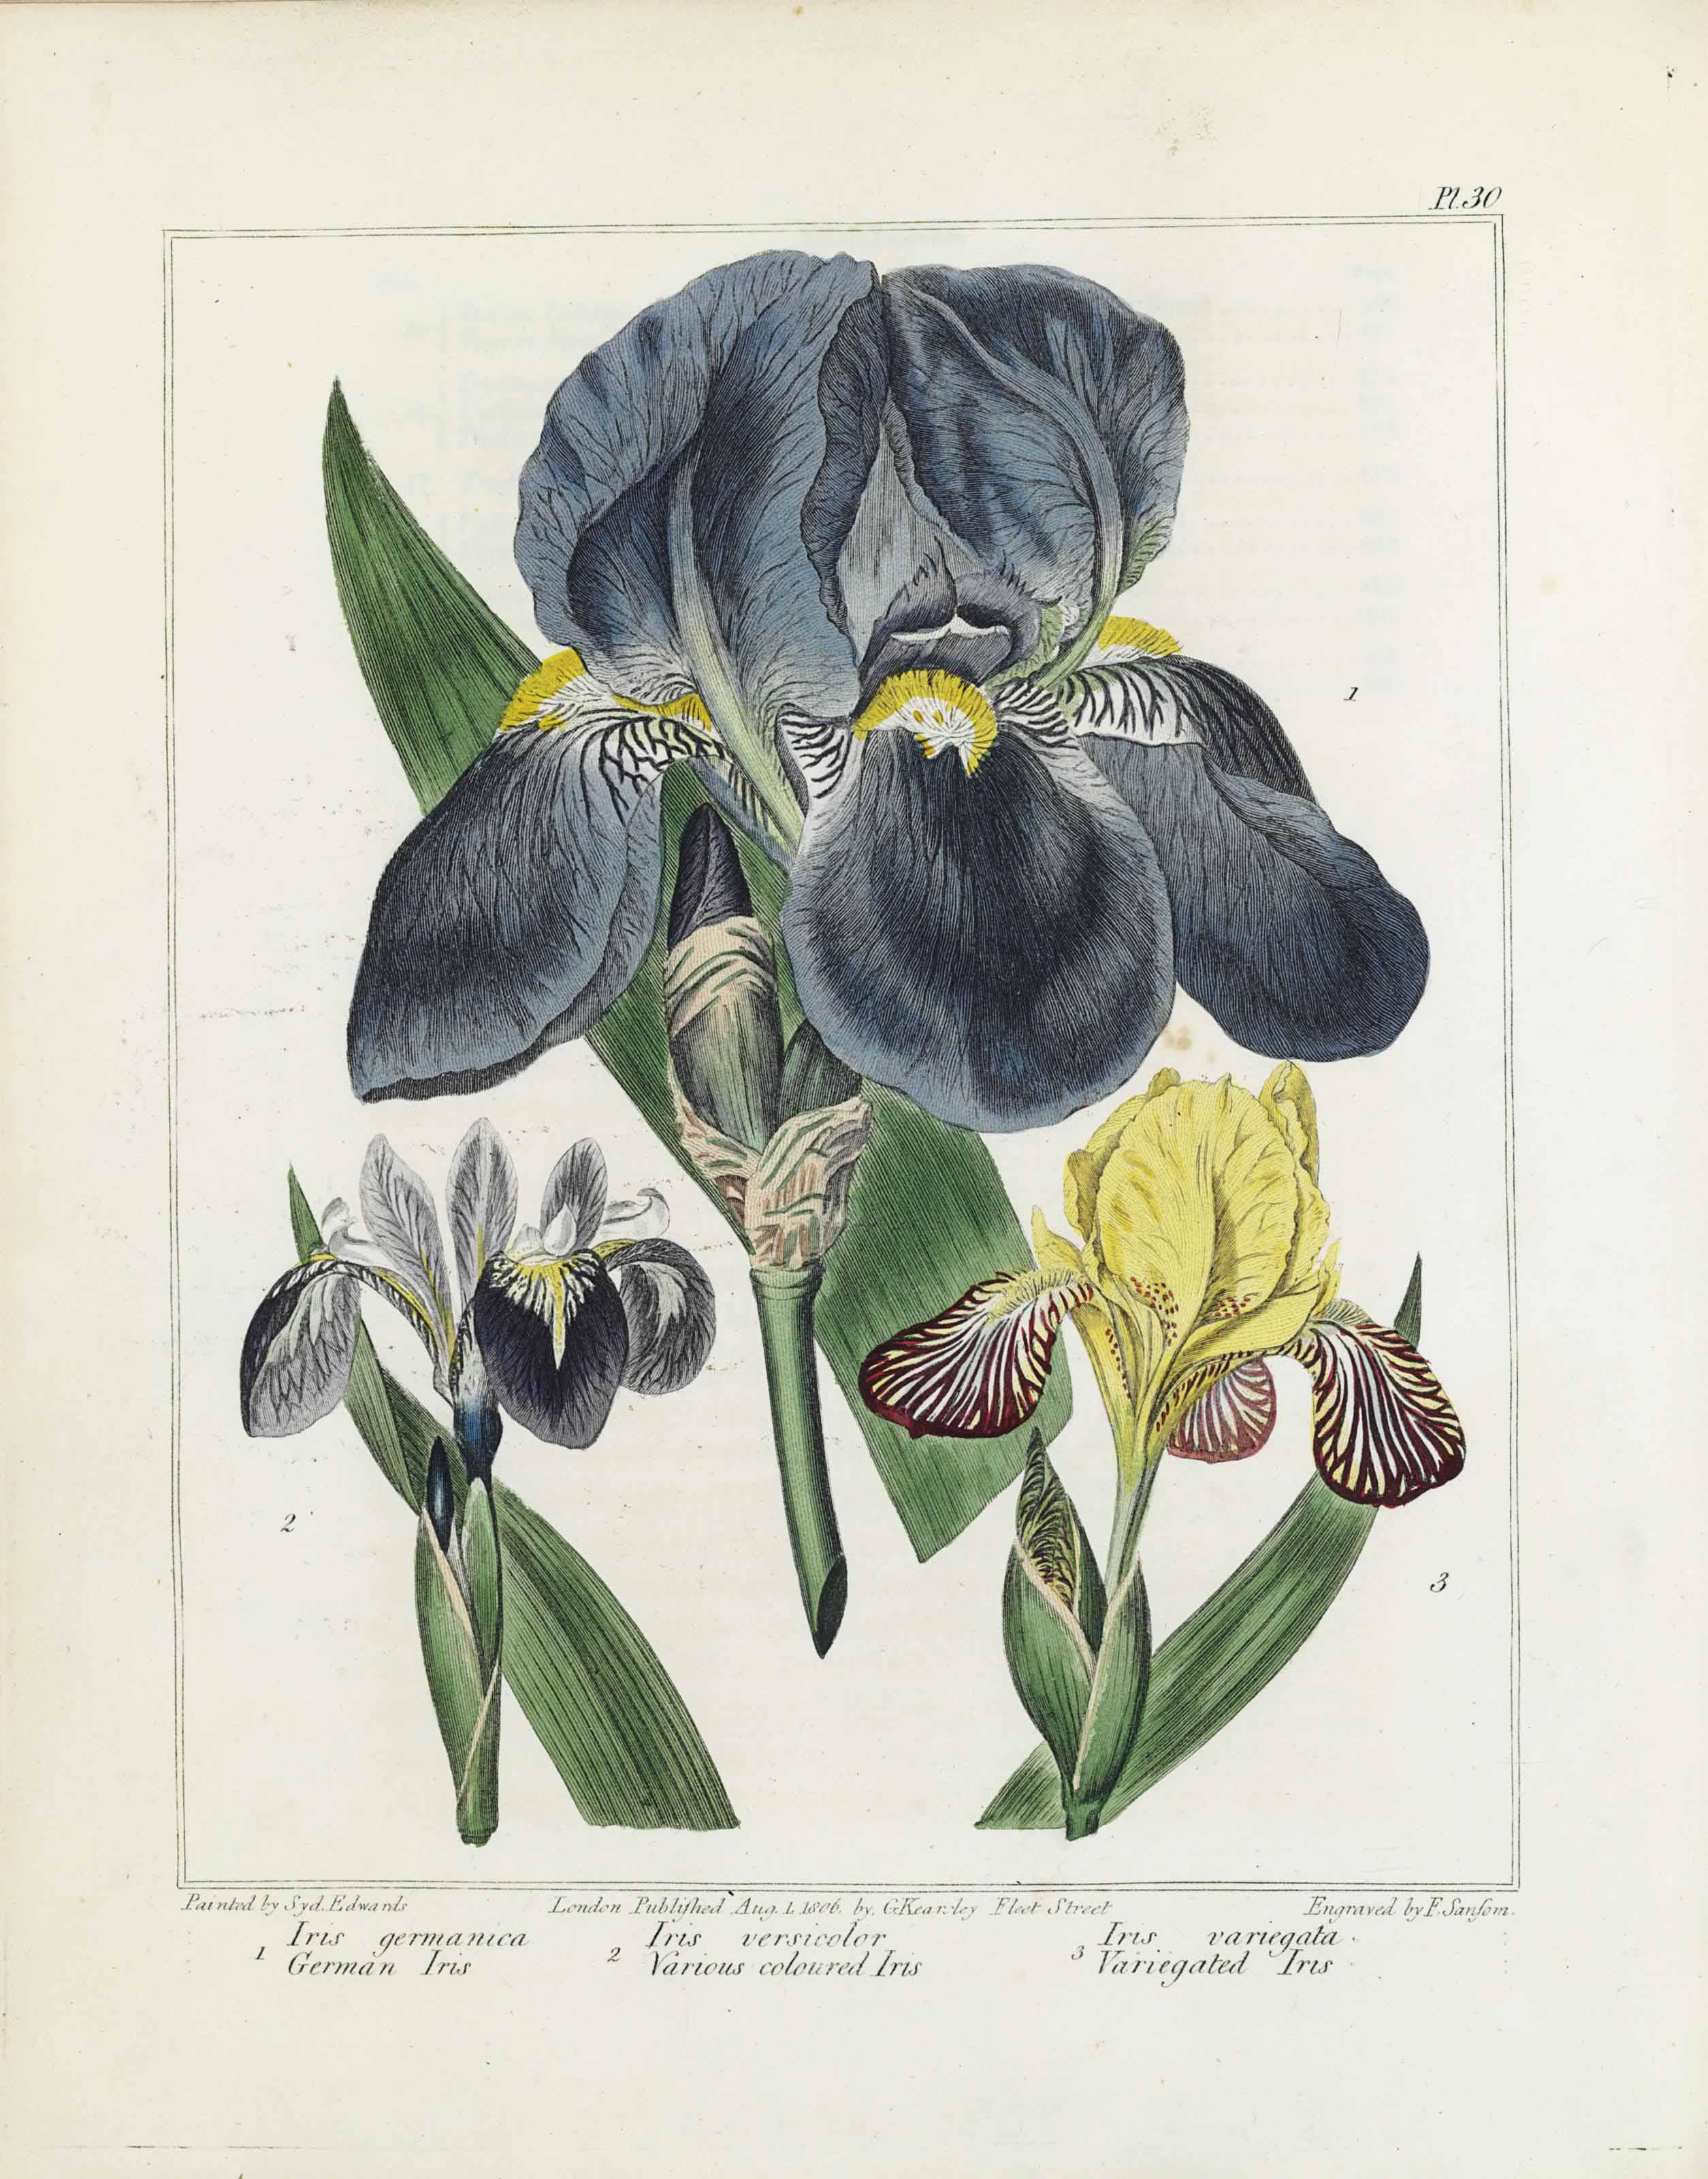 [DICKSON, R.W.] The New Botani